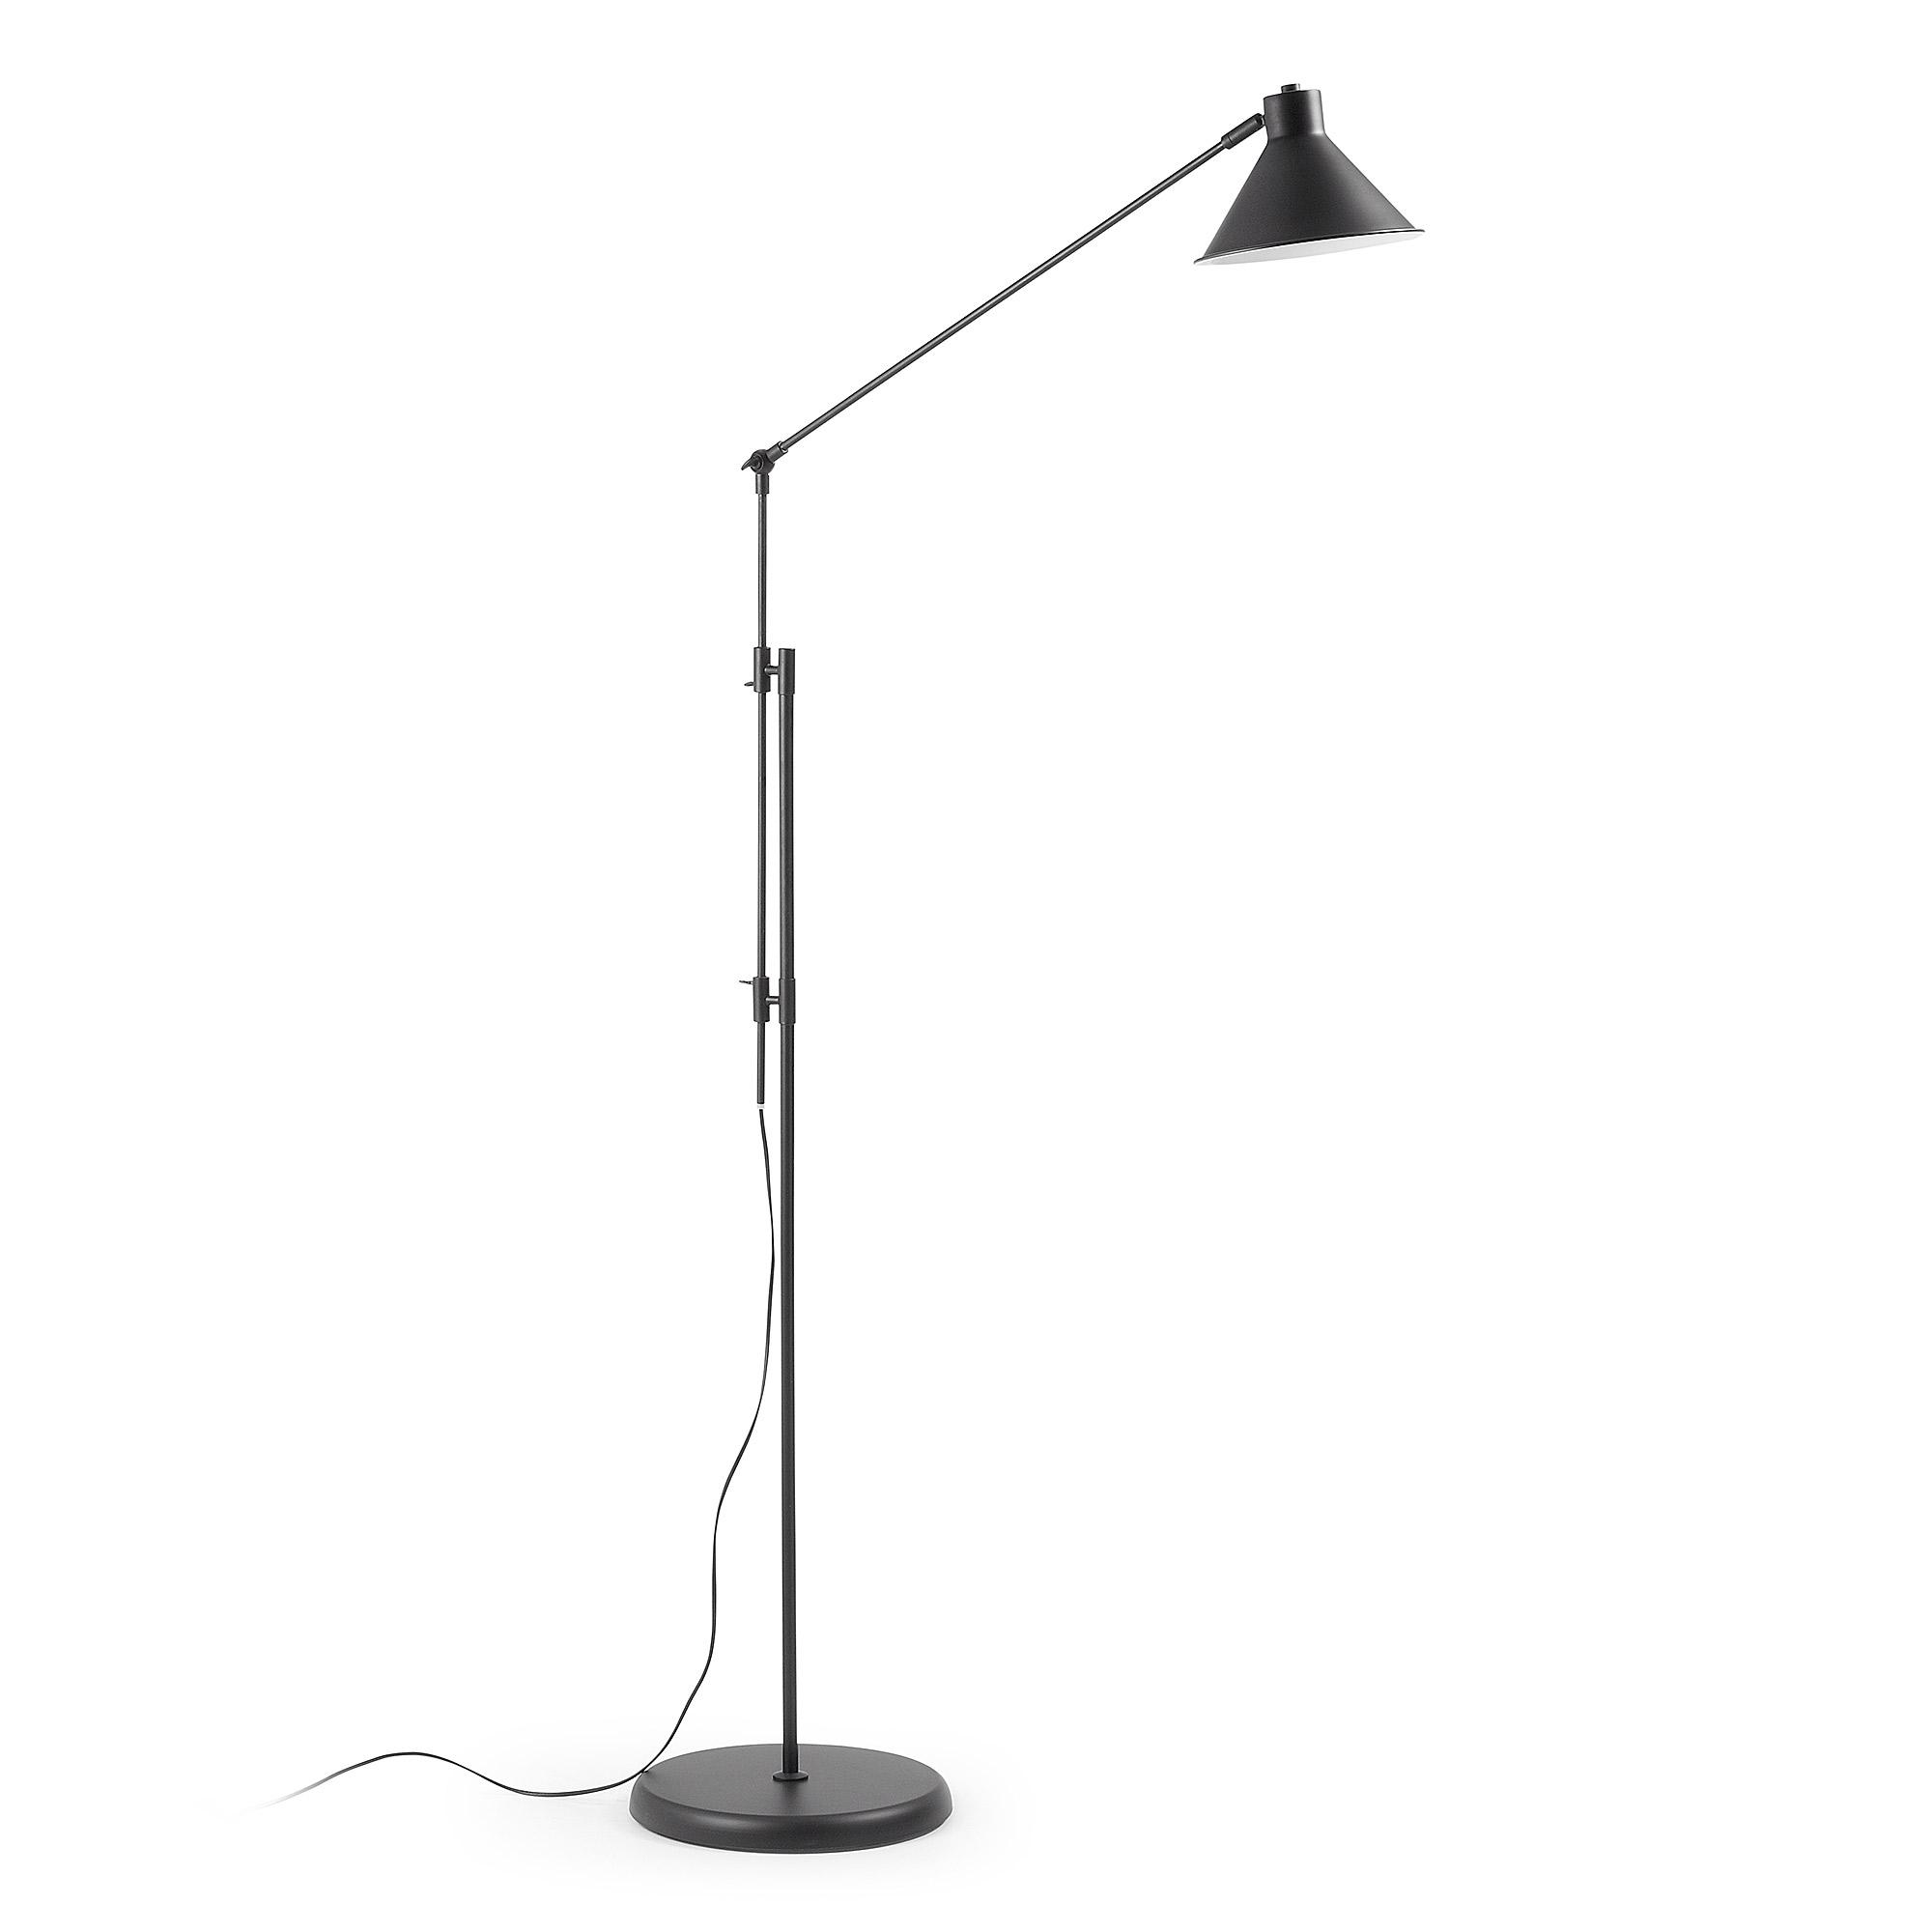 Kave Home vloerlamp 'Dione', kleur zwart